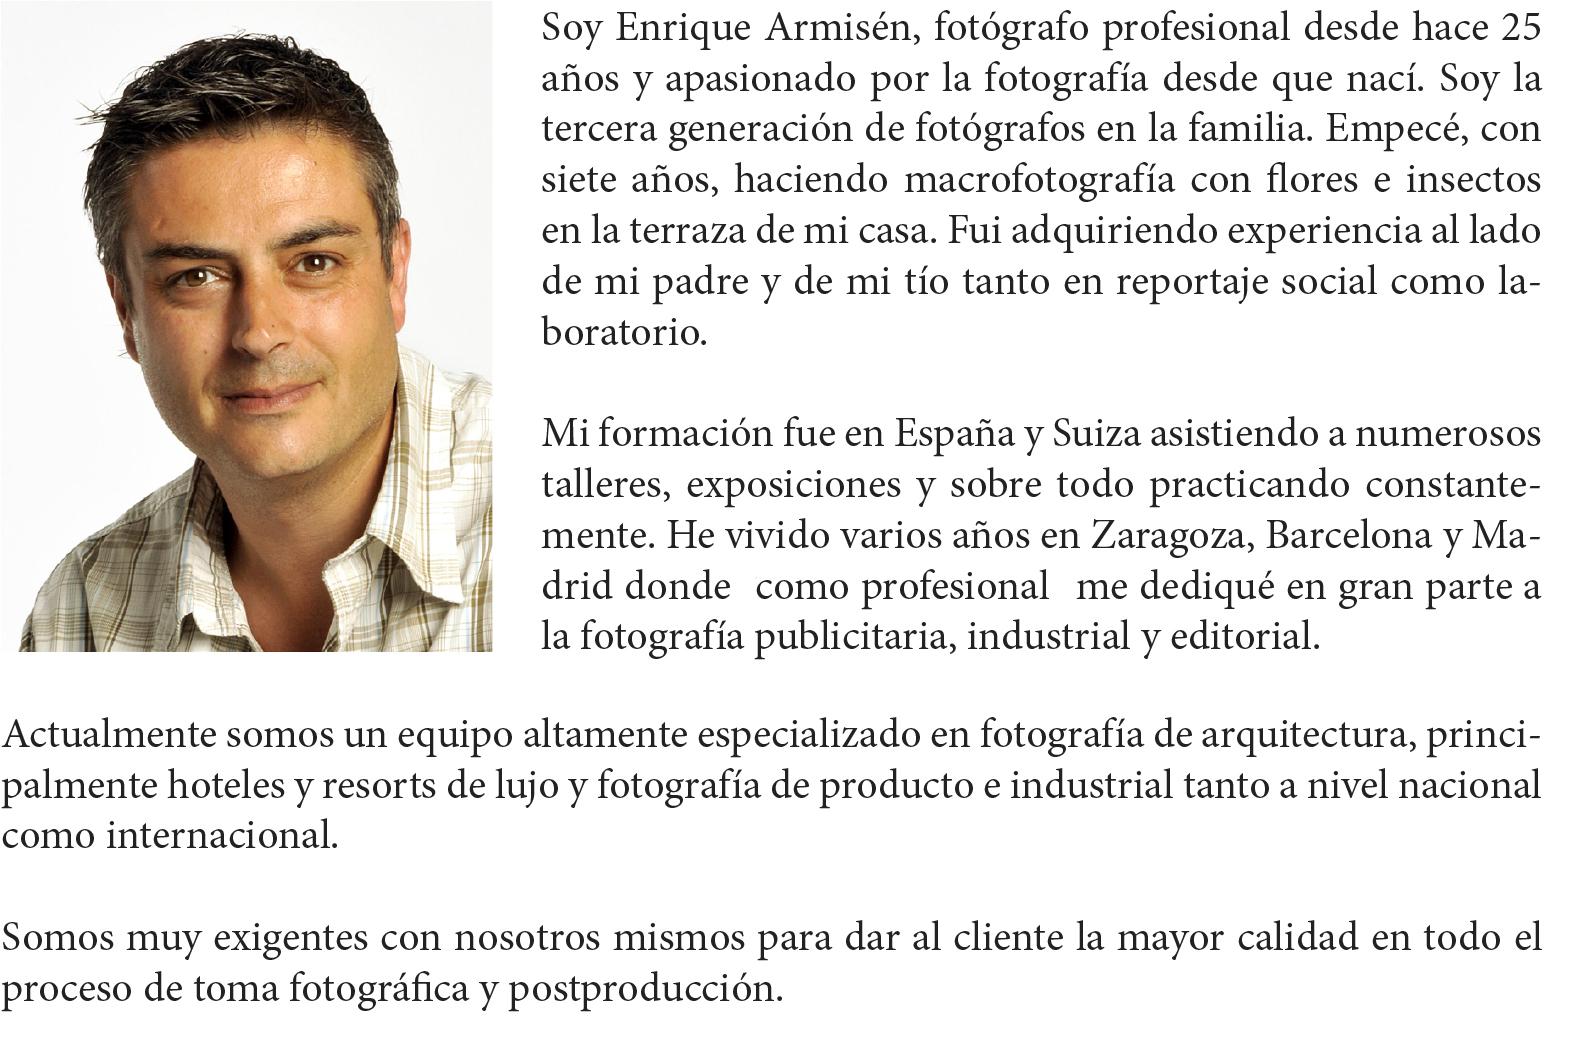 sobre mí, Enrique Armisén